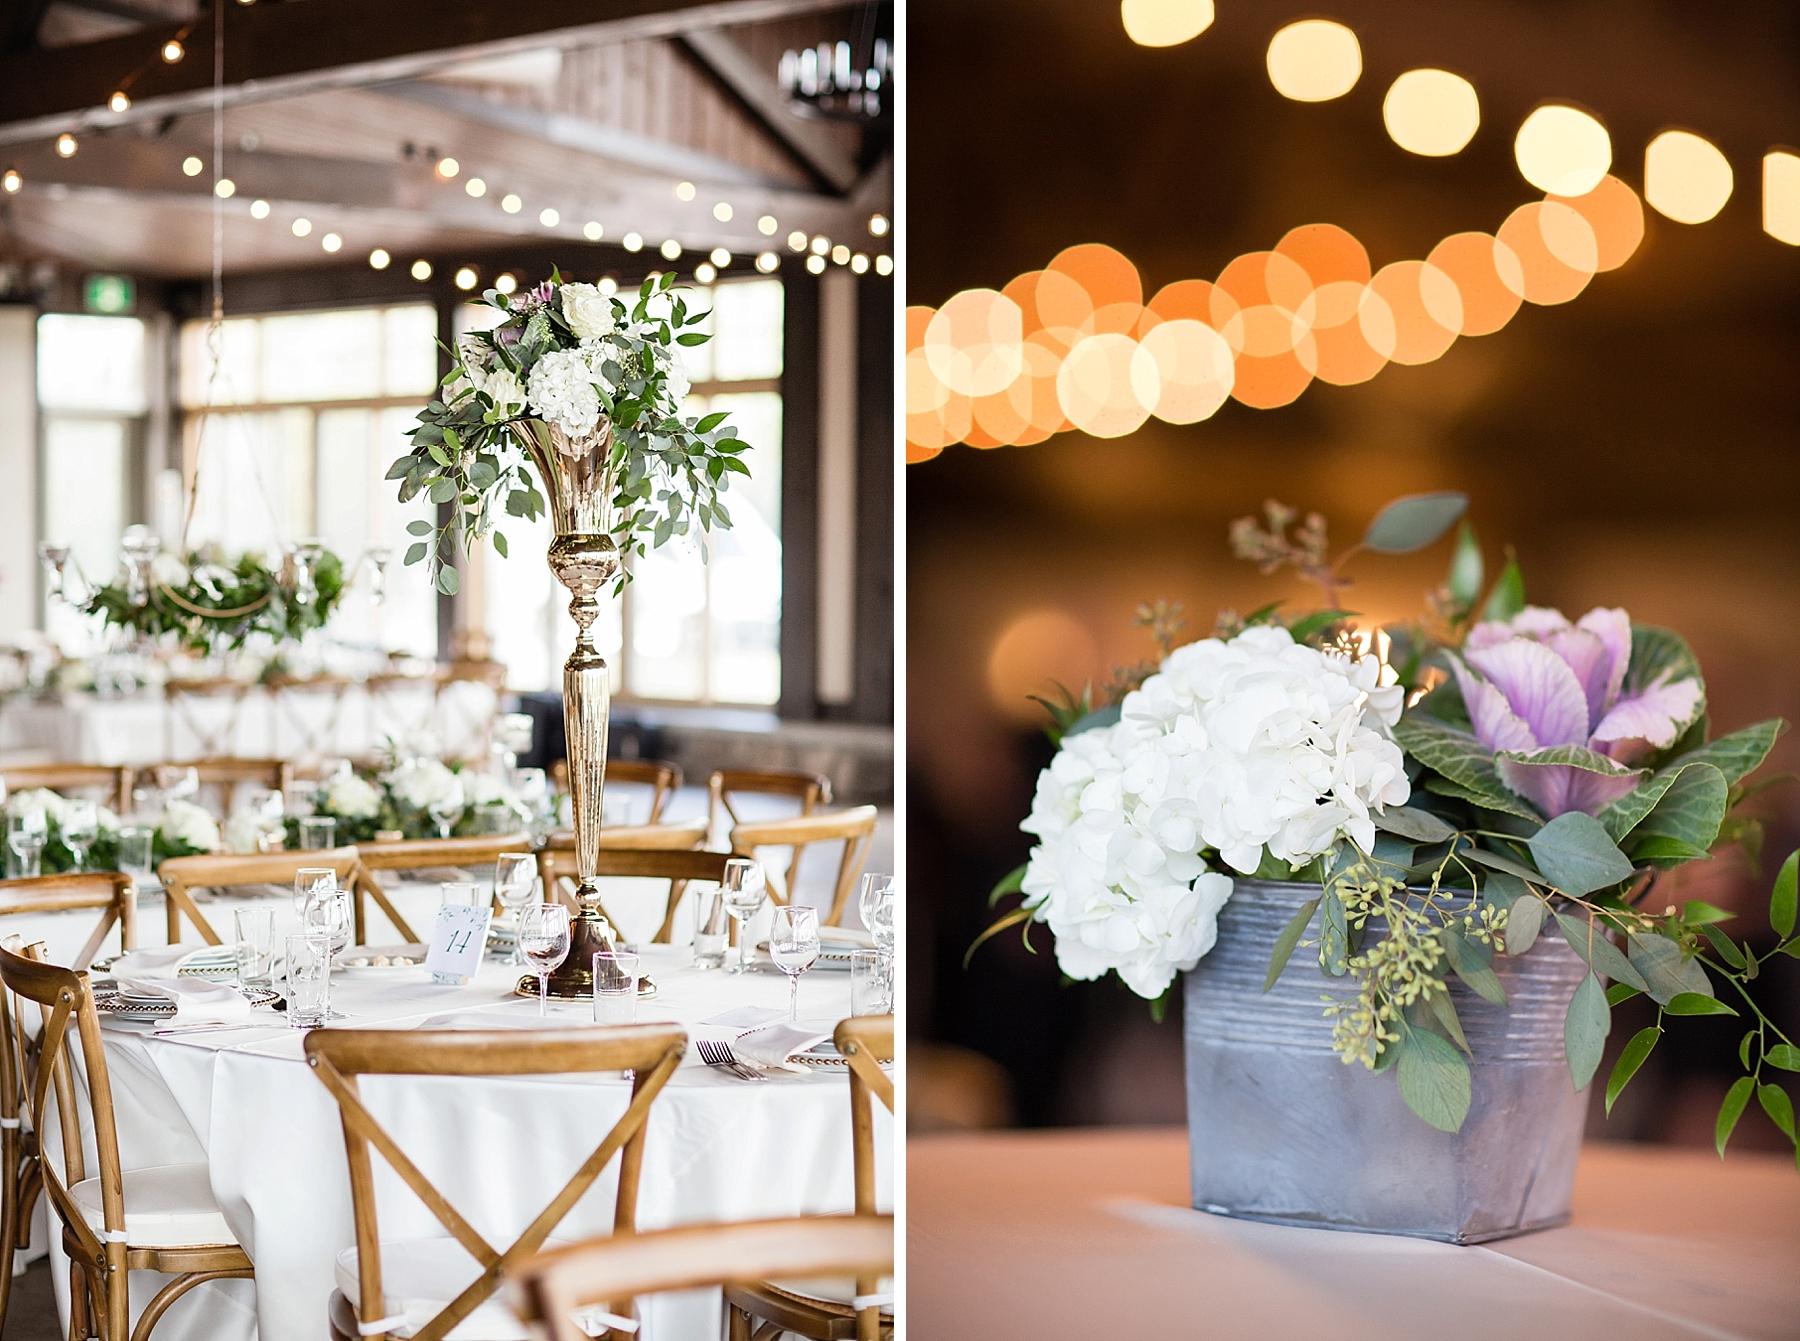 windsor-wedding-photographer-sprucewood-shores-winery-wedding-niagara-on-the-lake-wedding-photographer-eryn-shea-photography_0070.jpg